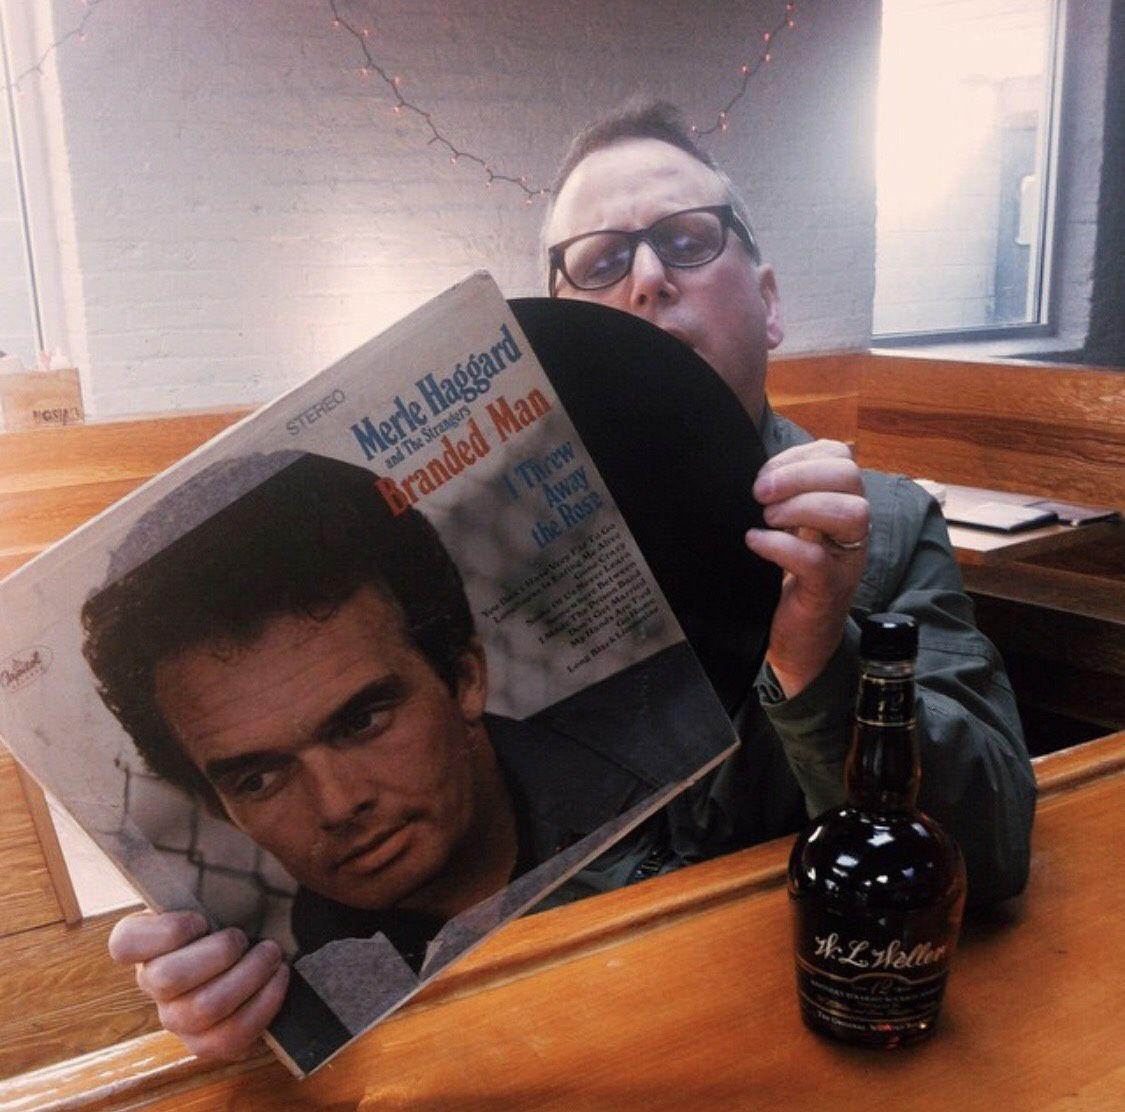 Paul Kahan sits at the bar at Big Star while looking at and pulling a record out of a Merle Haggard sleeve.